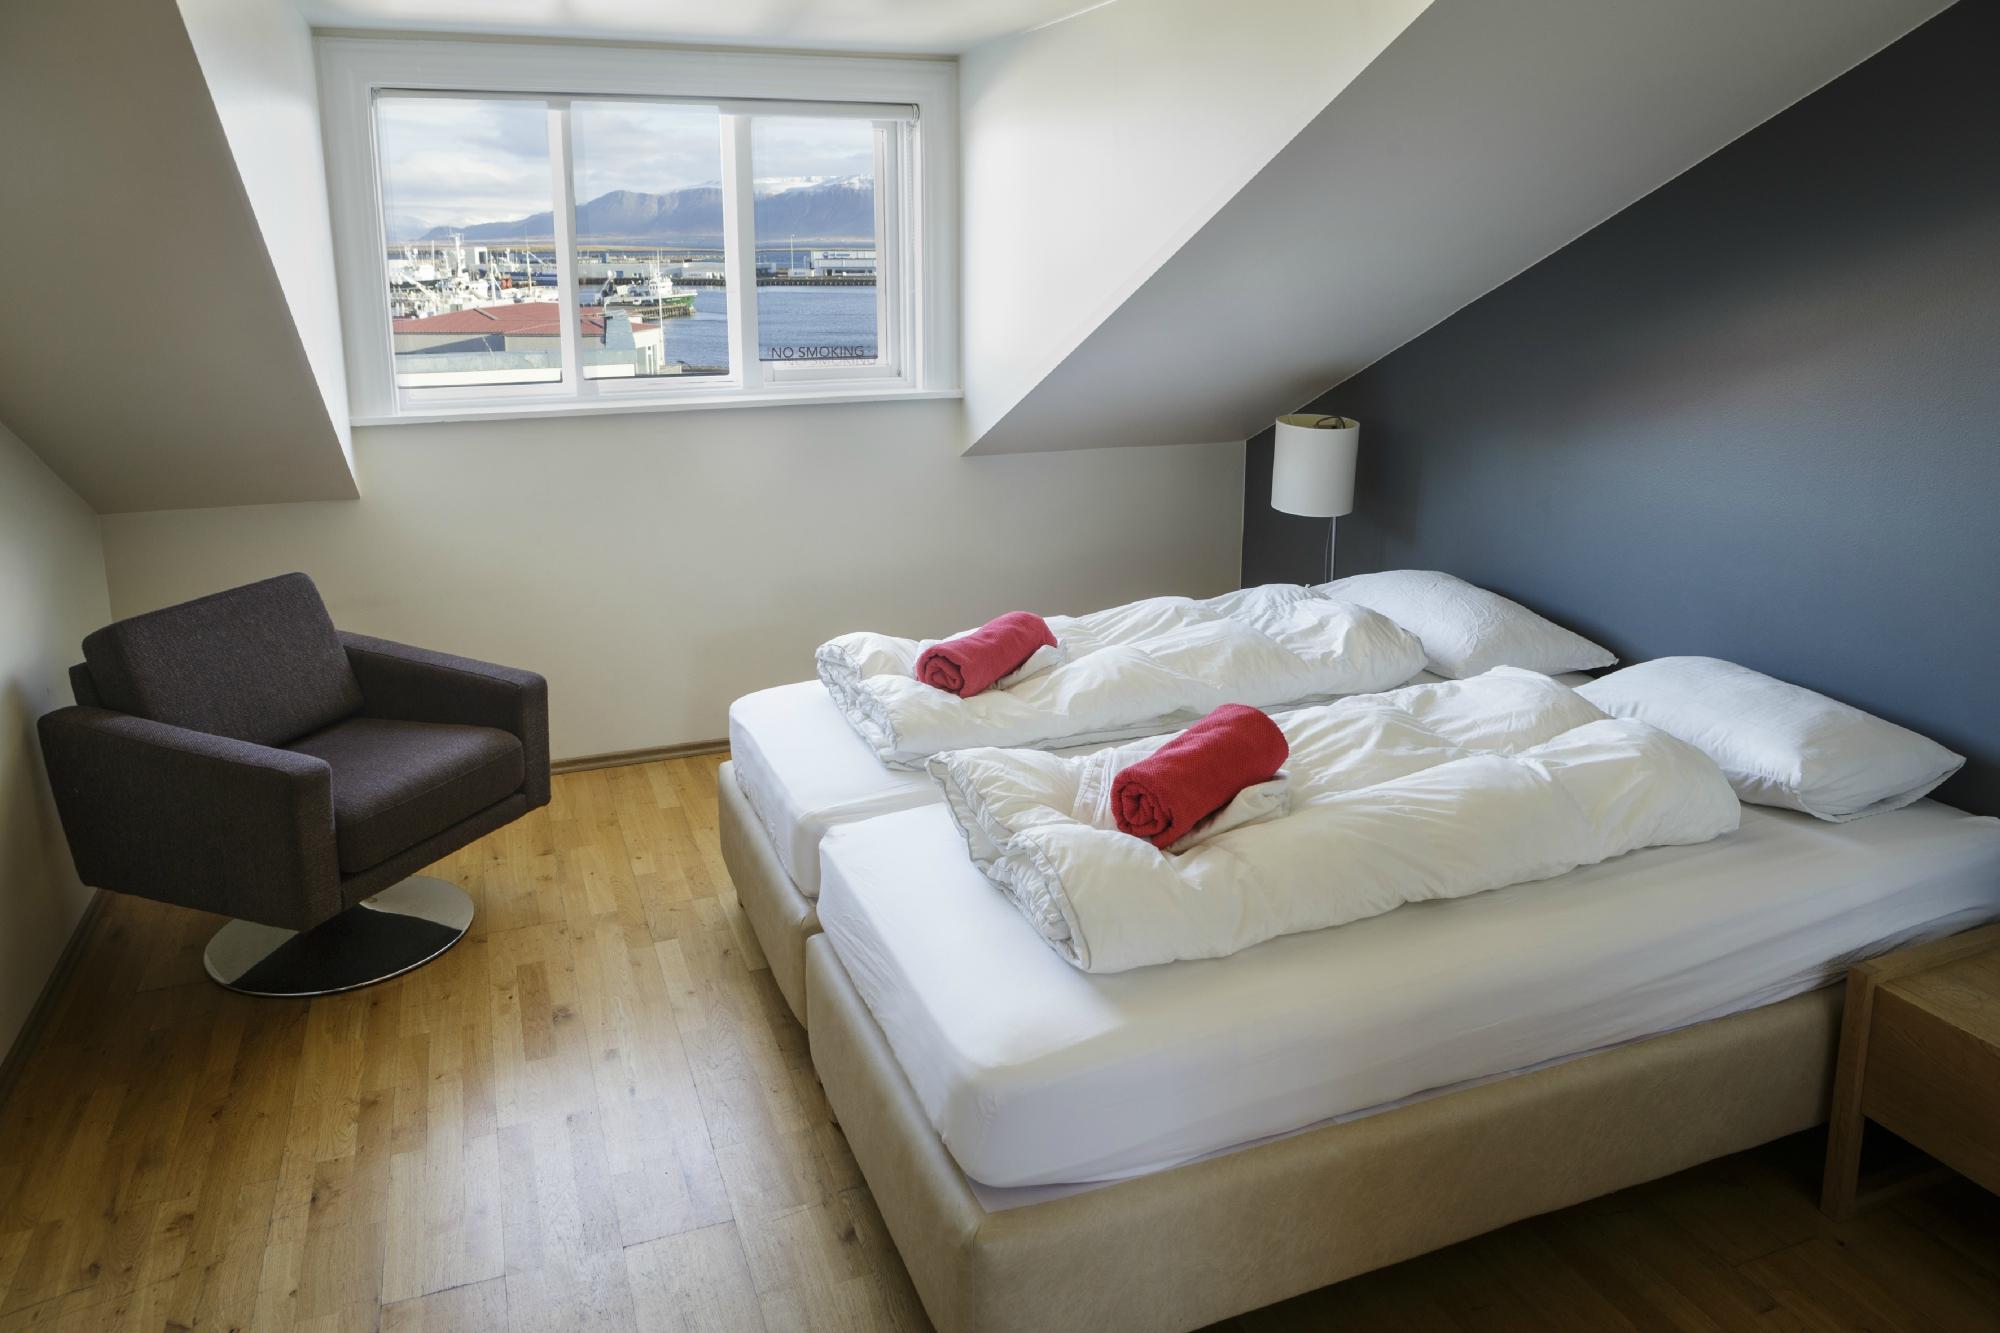 Reykjavik Downtown Hostel